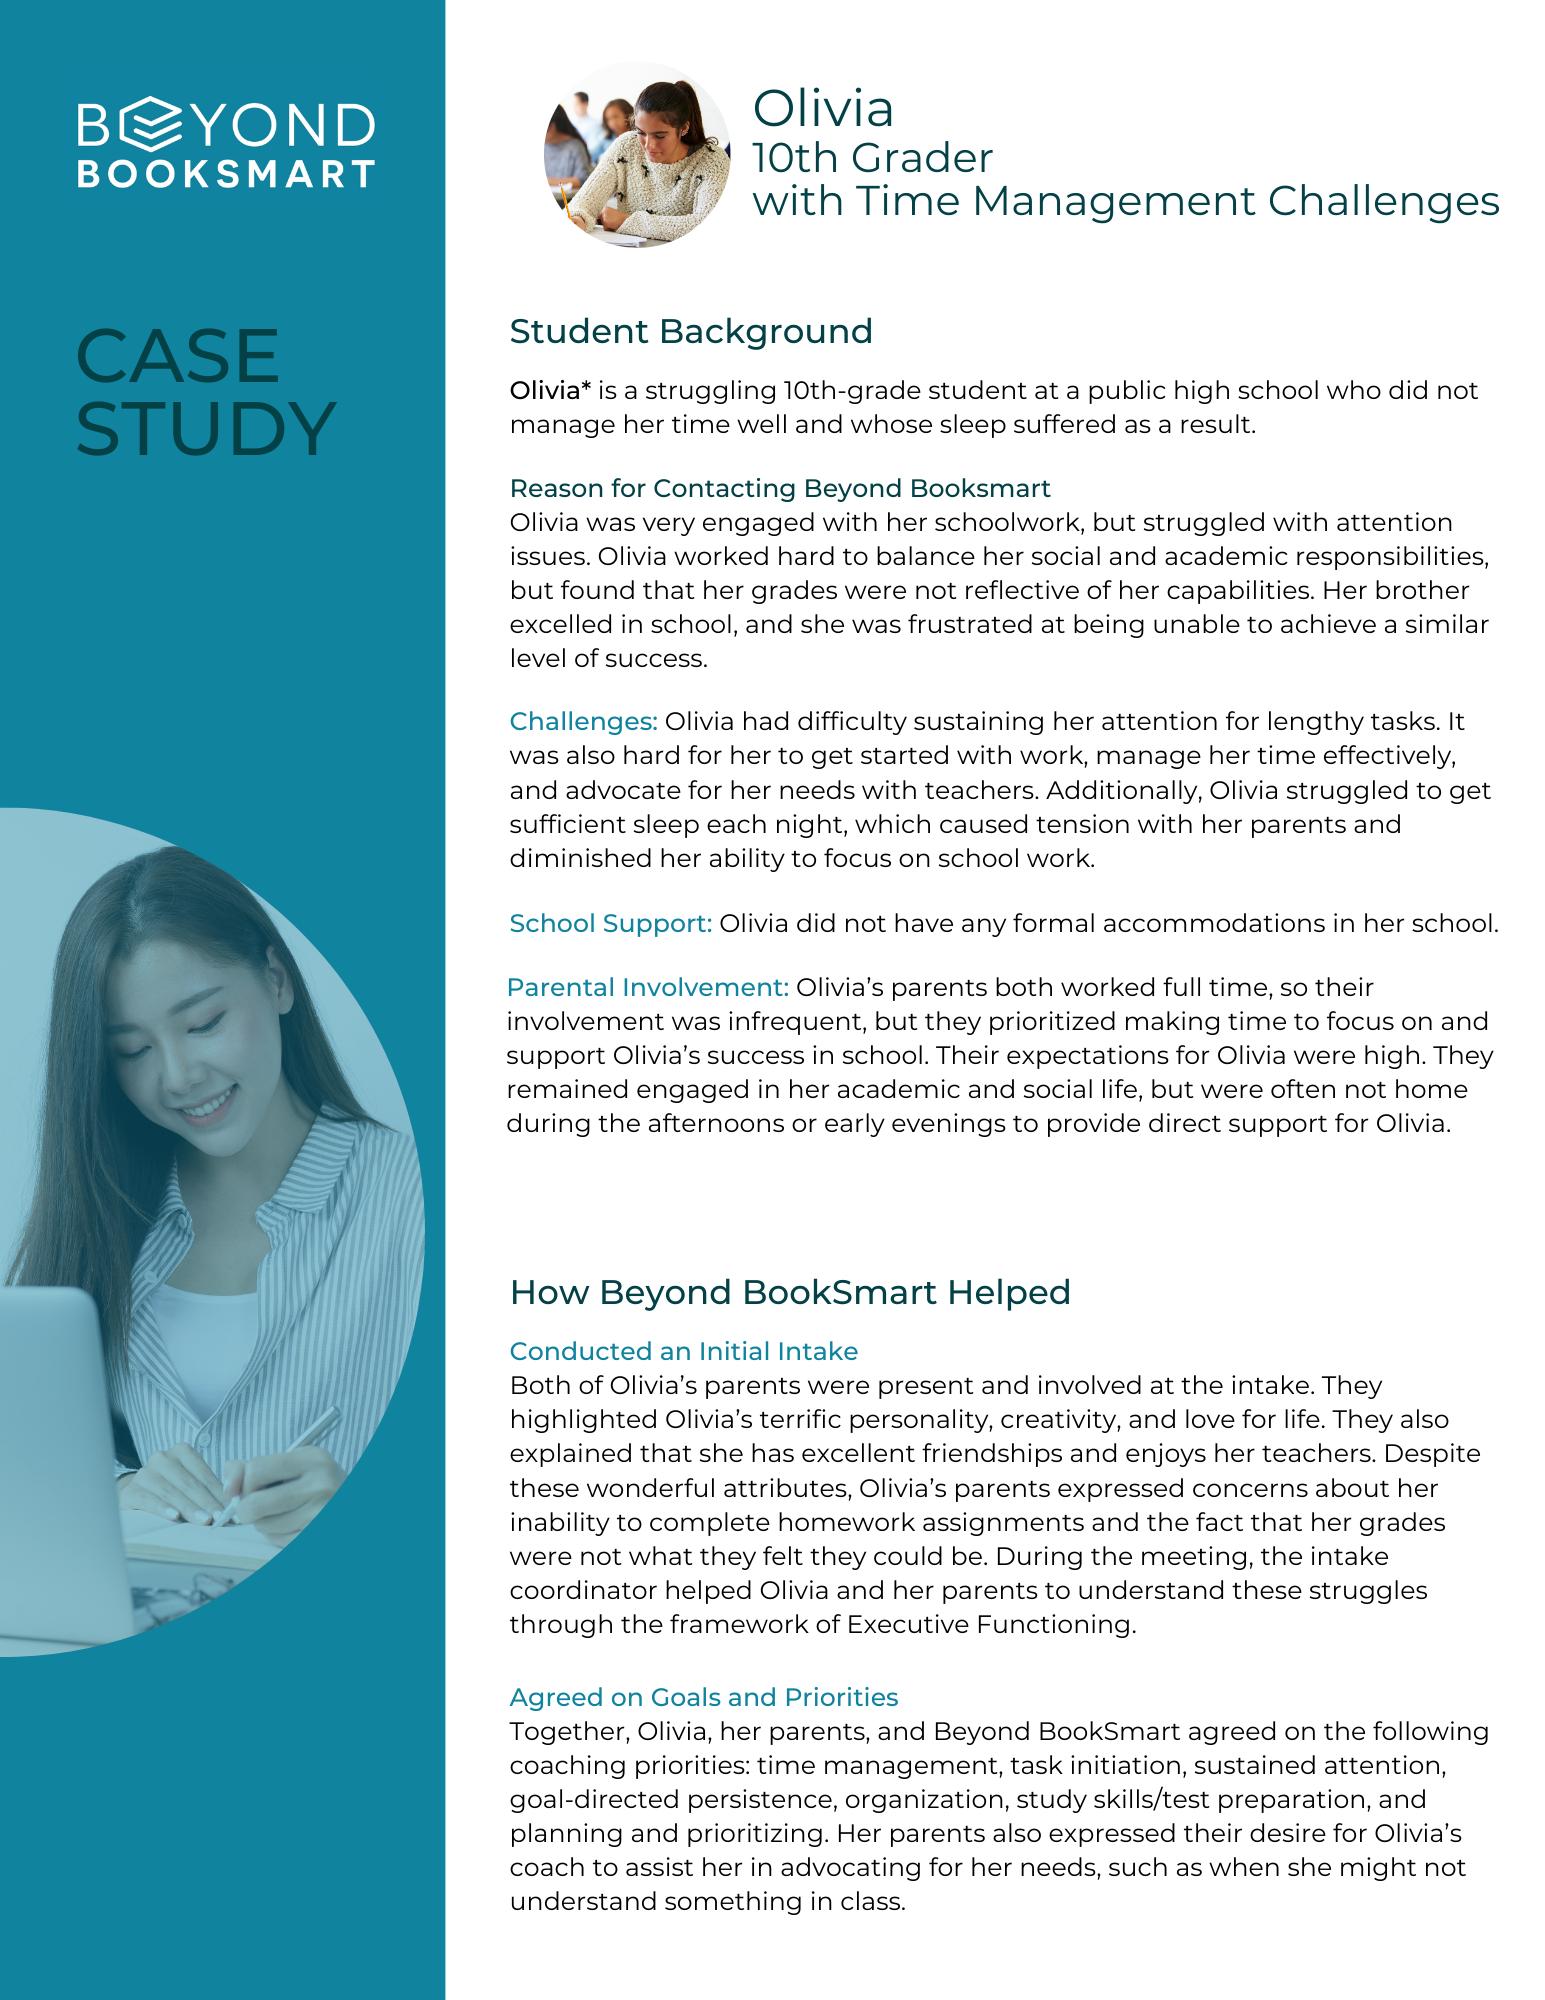 Case Study #6 Olivia